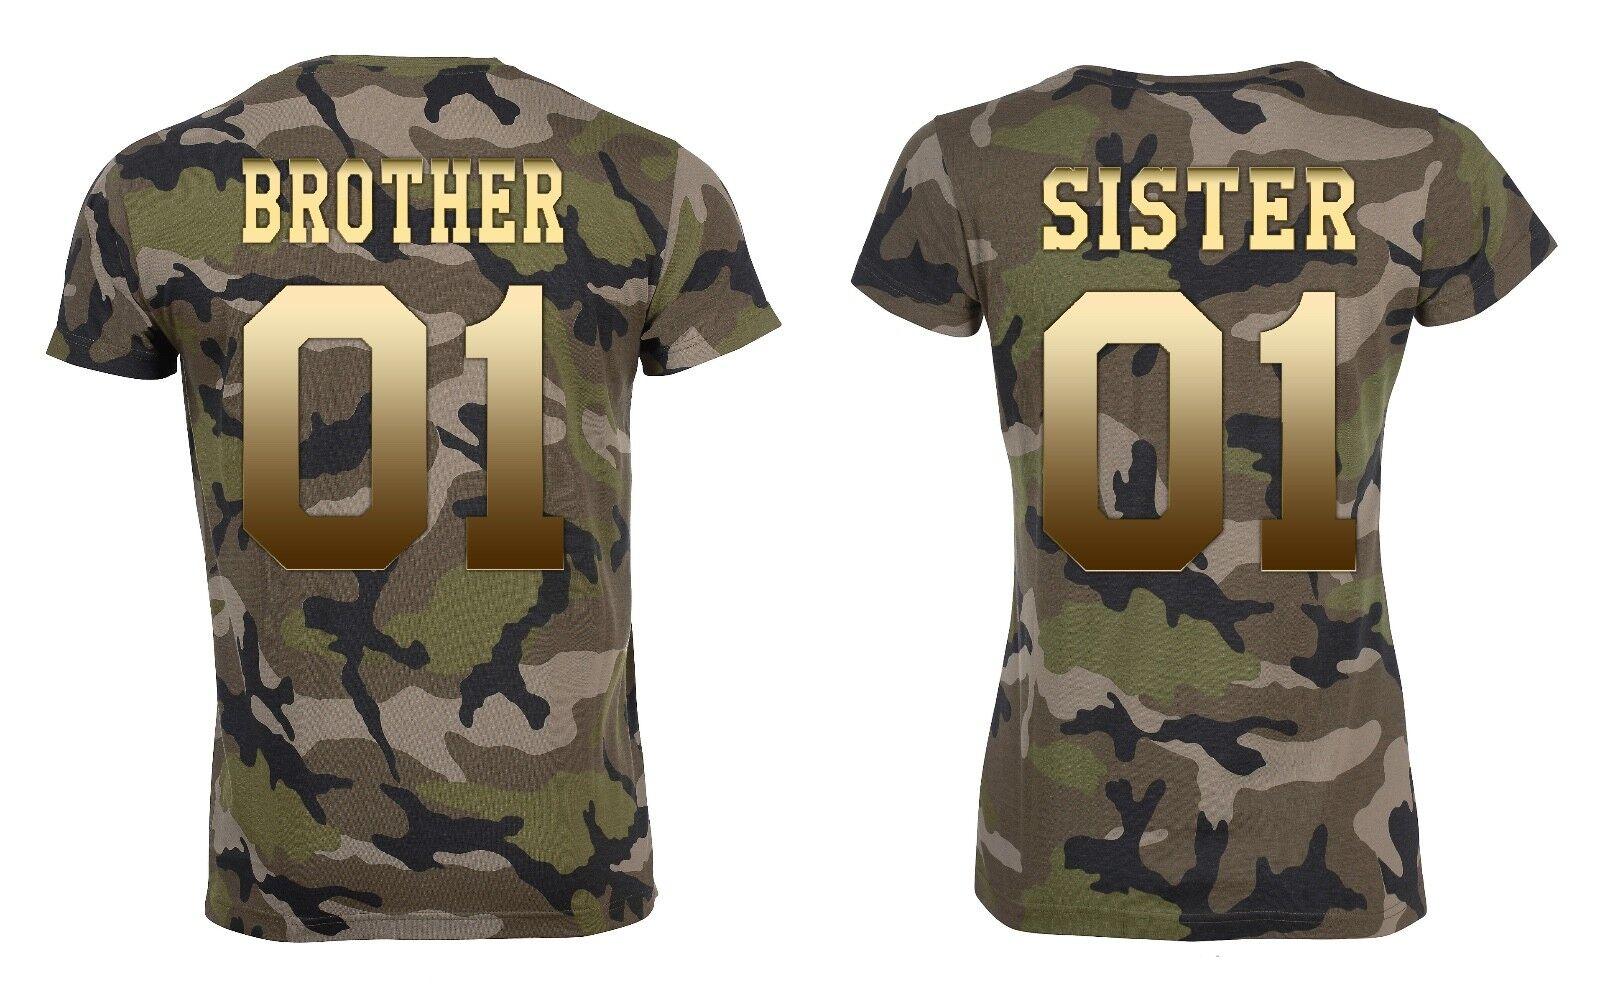 Partner Camouflage T-Shirt SET  BredHER & SISTER  mit WUNSCHZAHL king queen bff